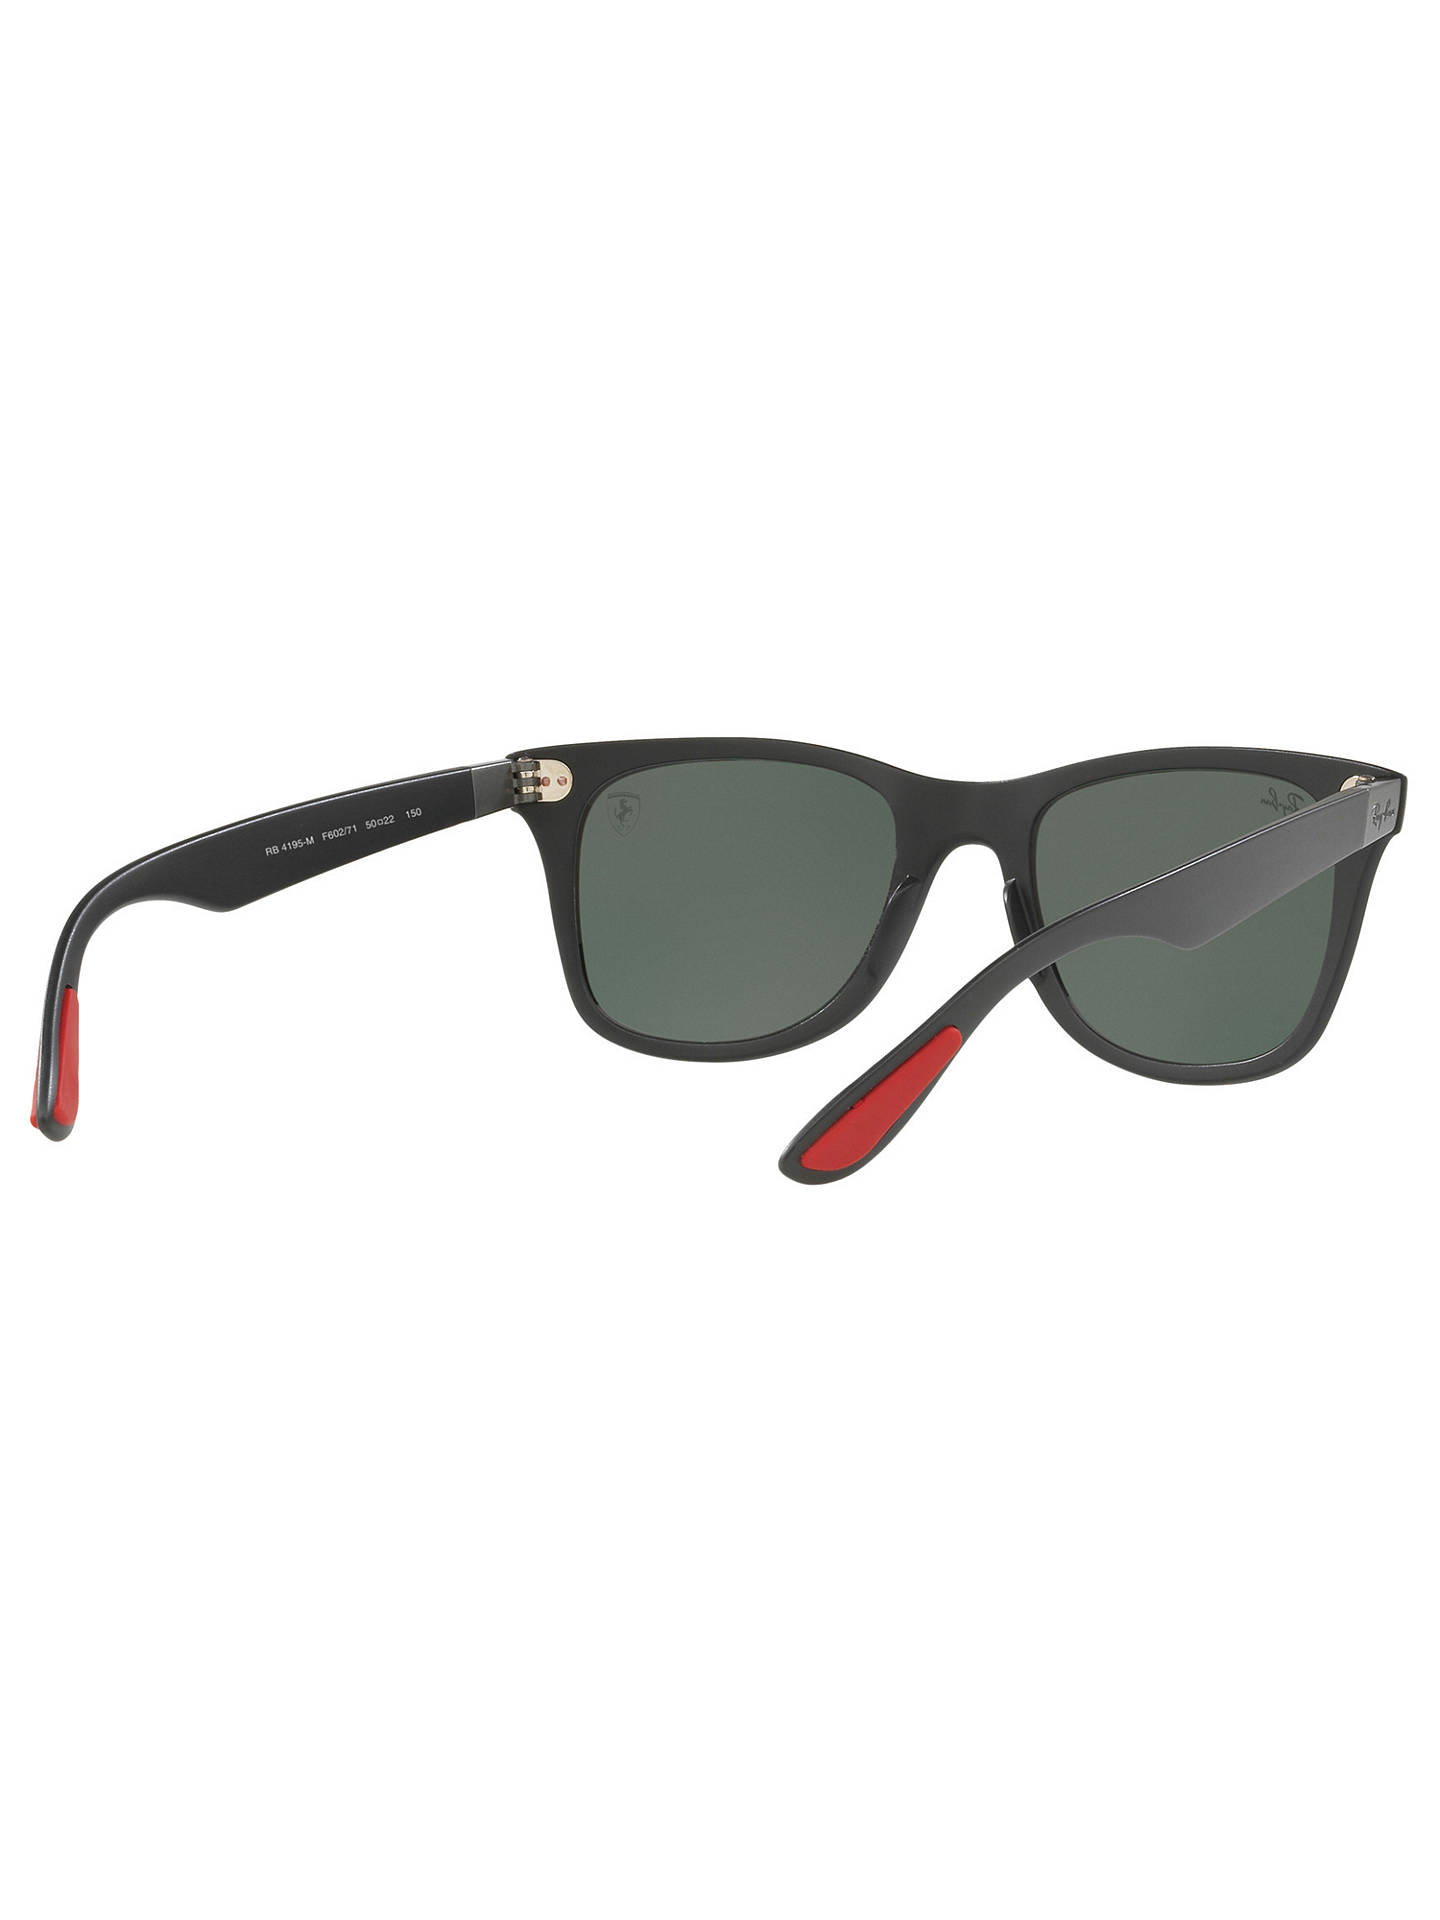 d9b1815a2d3 Ray-Ban RB4195M Scuderia Ferrari Wayfarer Sunglasses at John Lewis ...